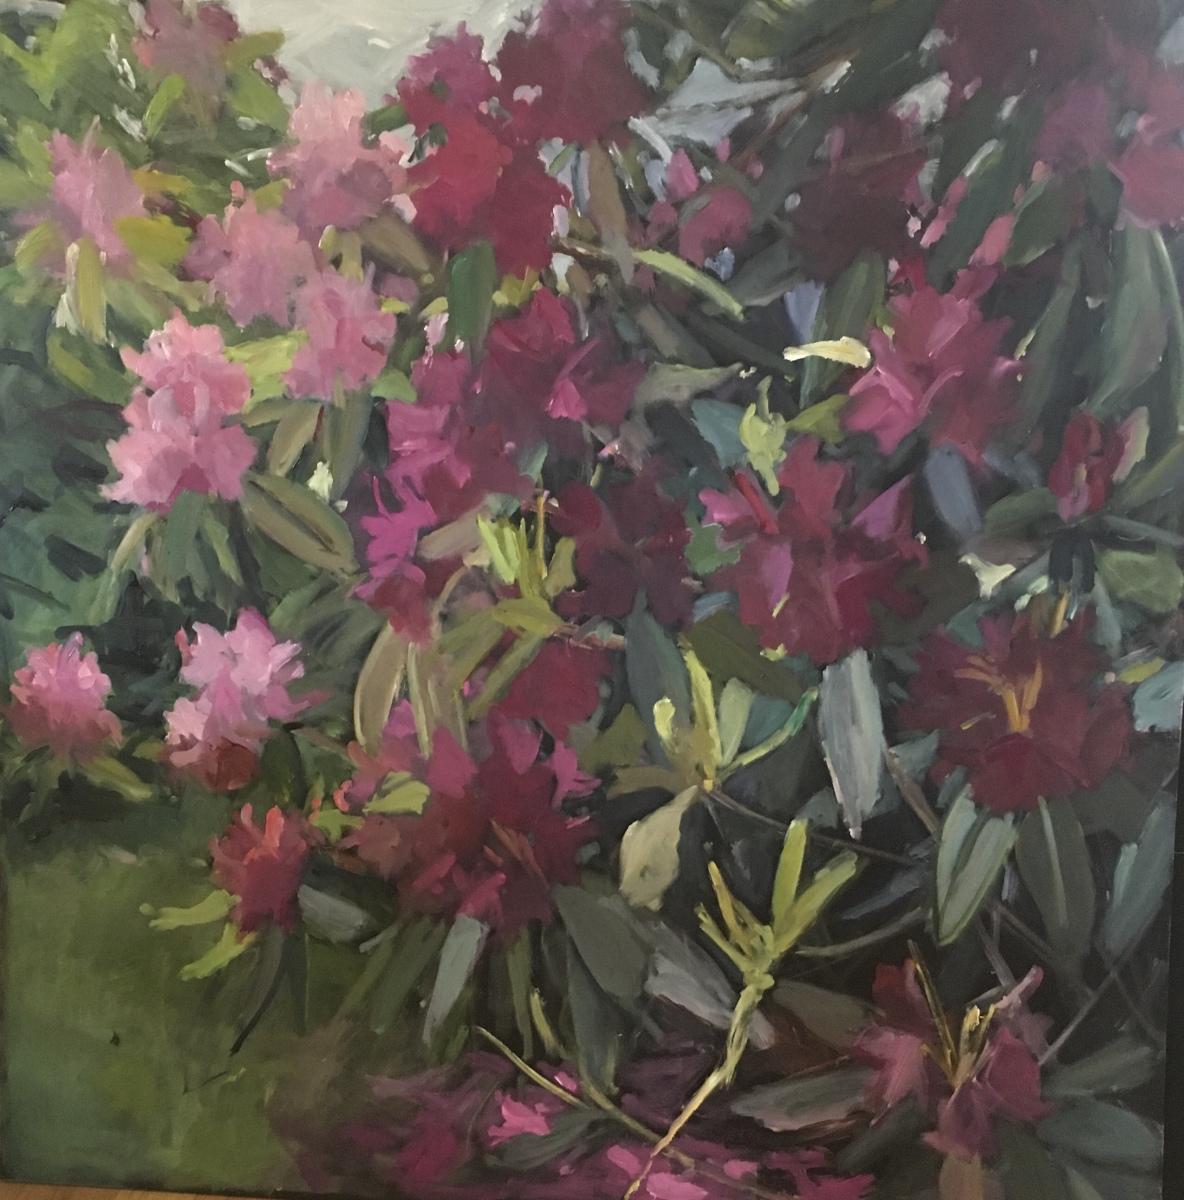 Pink Rhoddies from Carruth